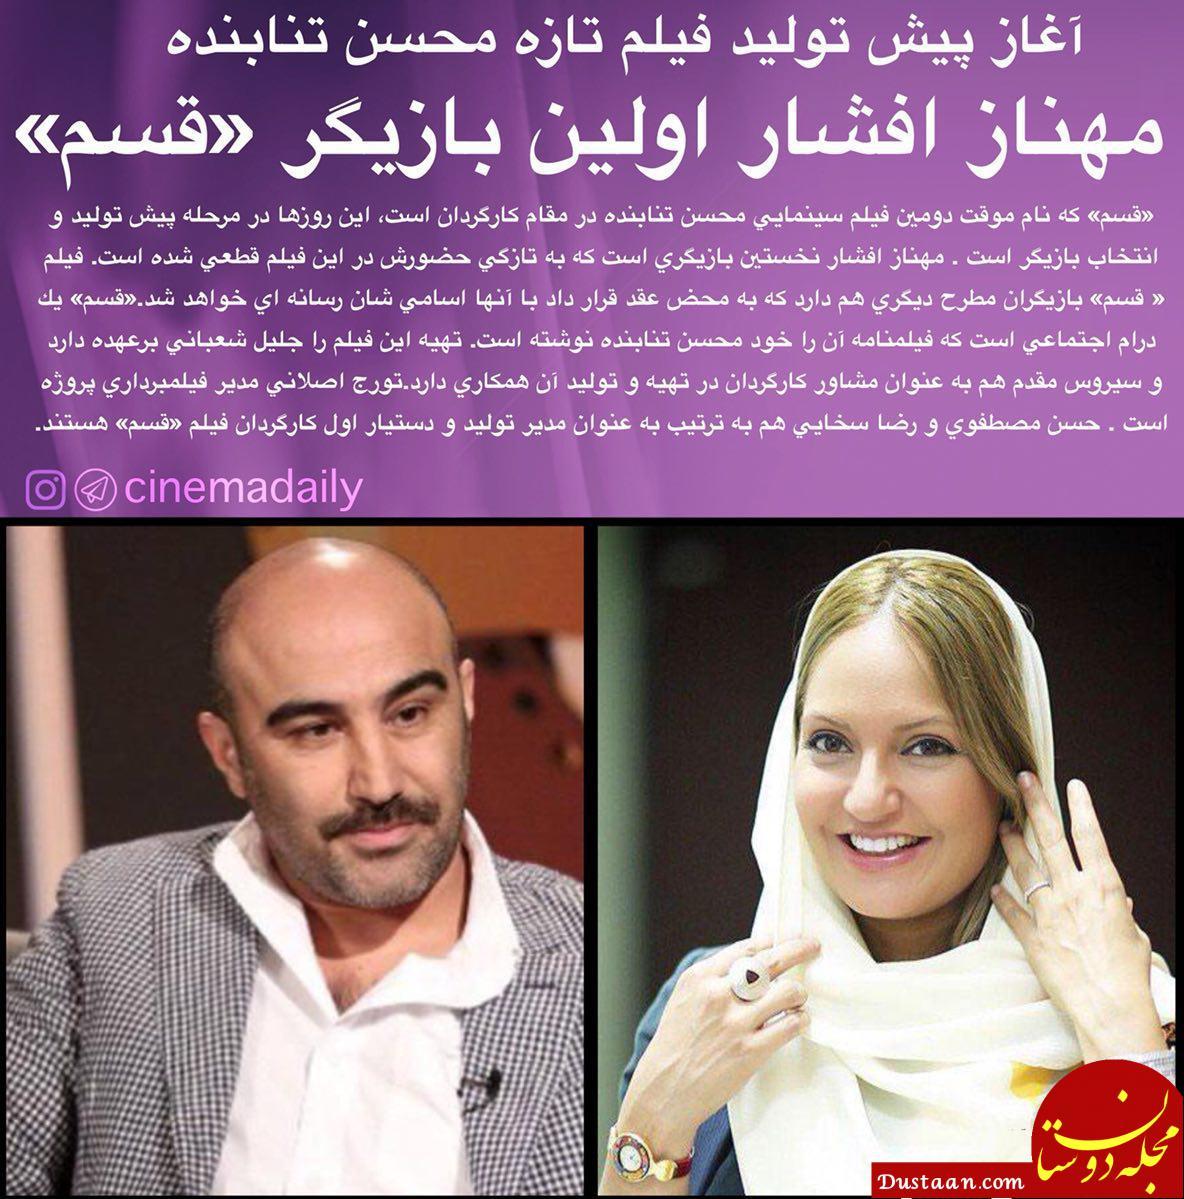 www.dustaan.com مهناز افشار اولین بازیگر فیلم محسن تنابنده شد +عکس